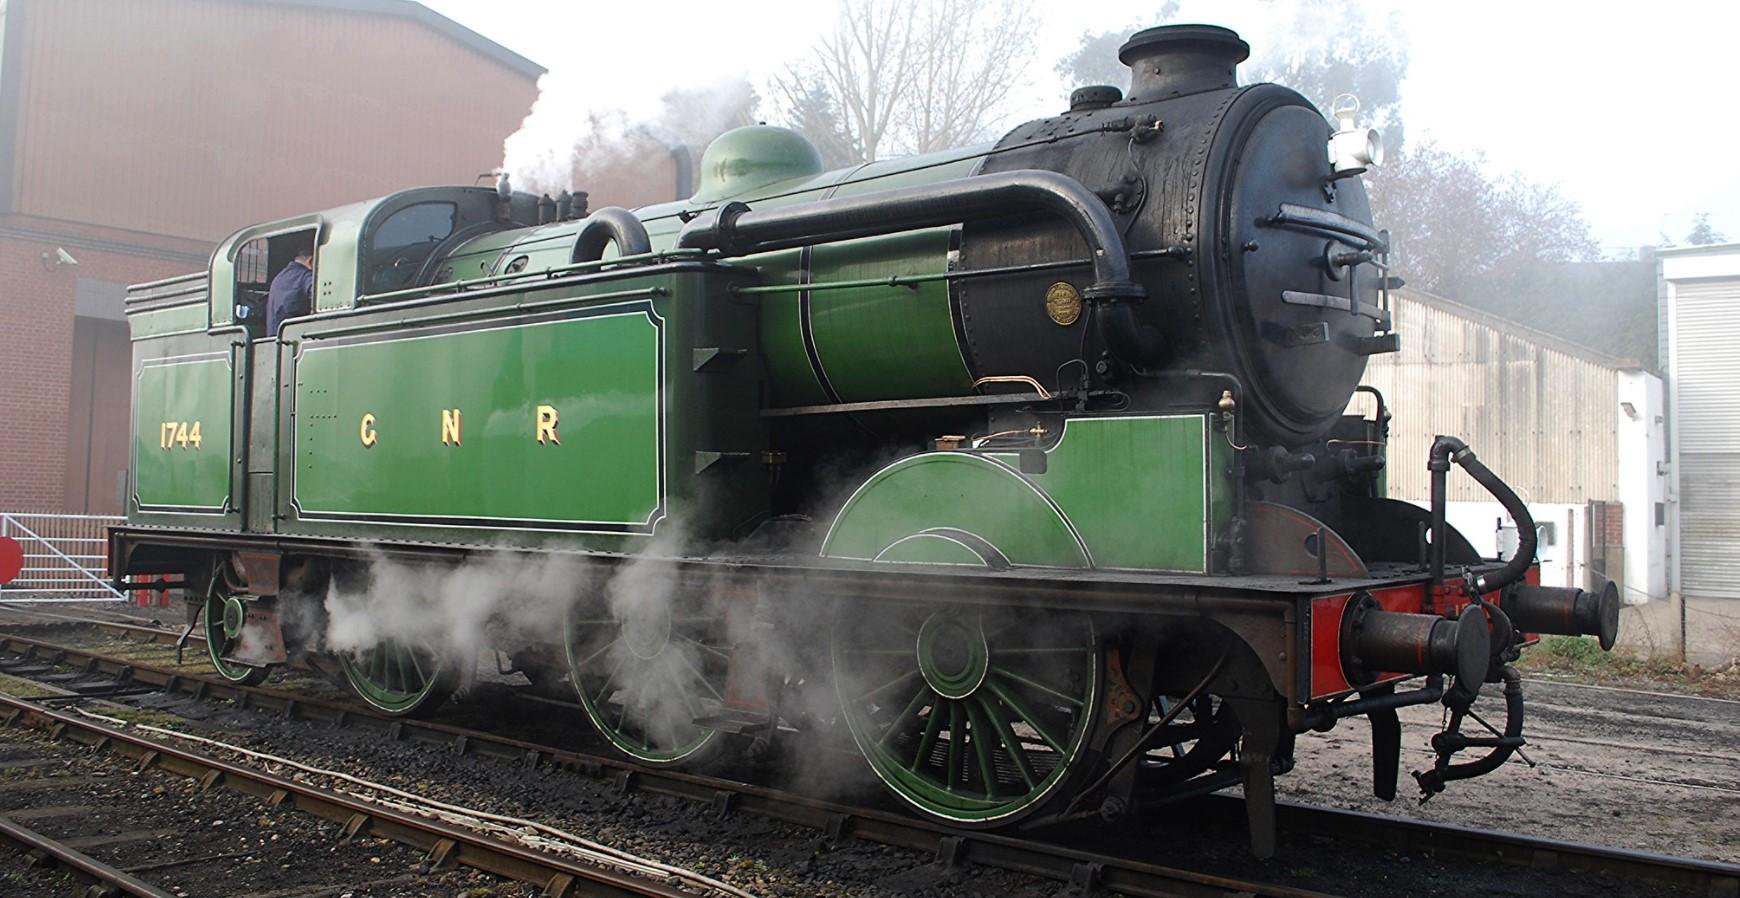 1744 at Bridgnorth on the Severn Valley Railway in March 2012. ©Hugh Llewelyn